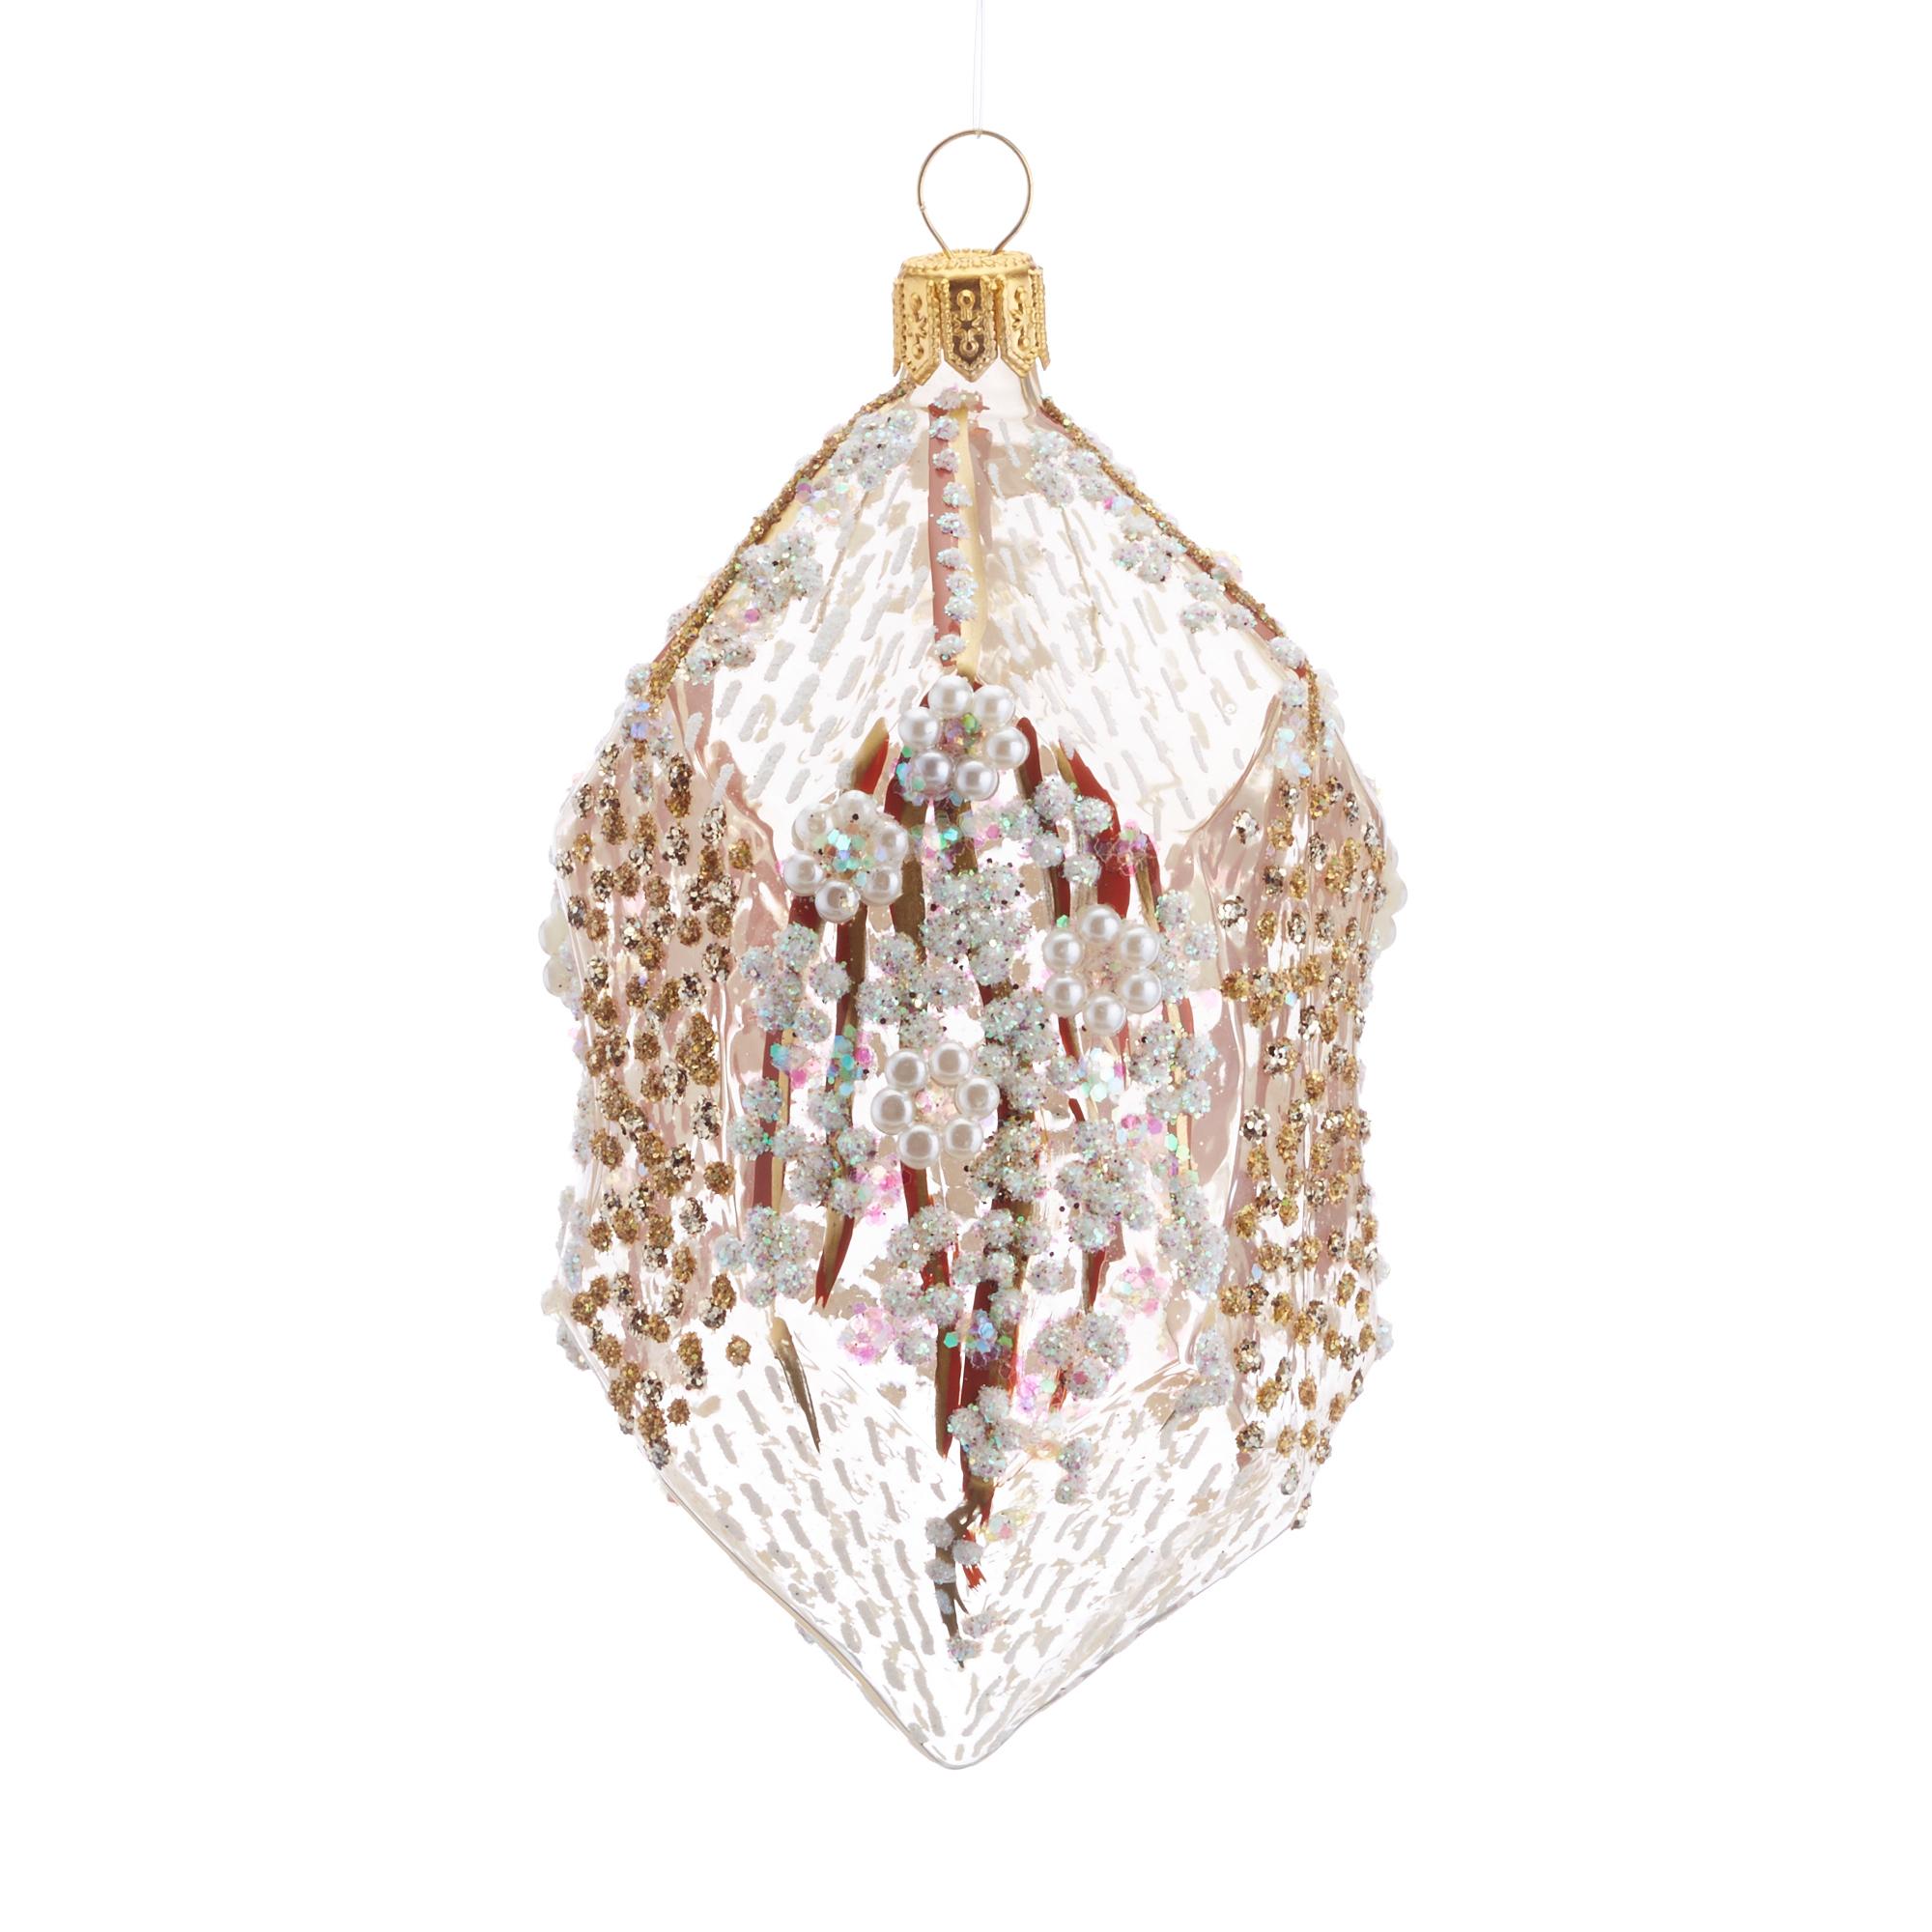 Winter Geode Glass Christmas Ornament | Gump\'s